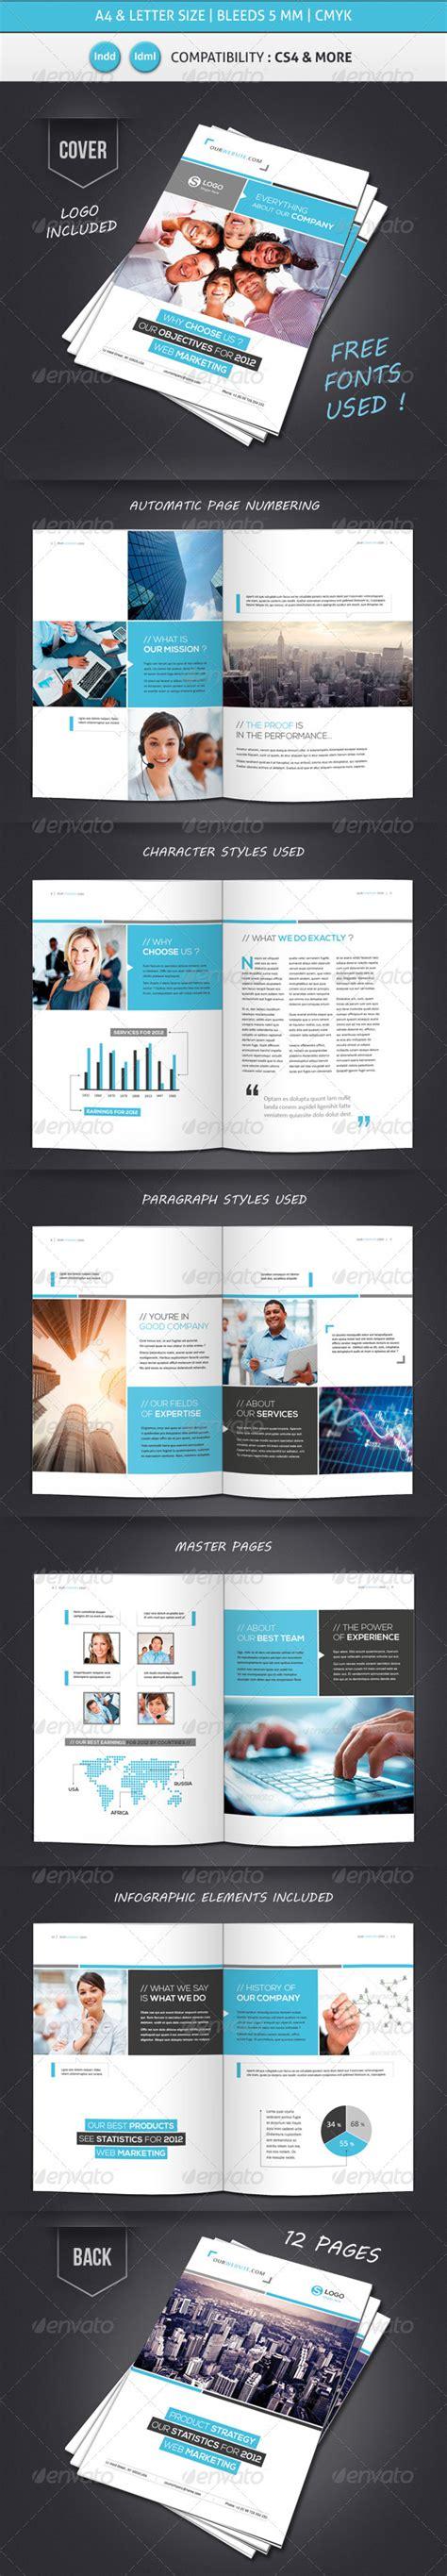 Memo Template Graphicriver corporate brochure presentation styles 187 tinkytyler org